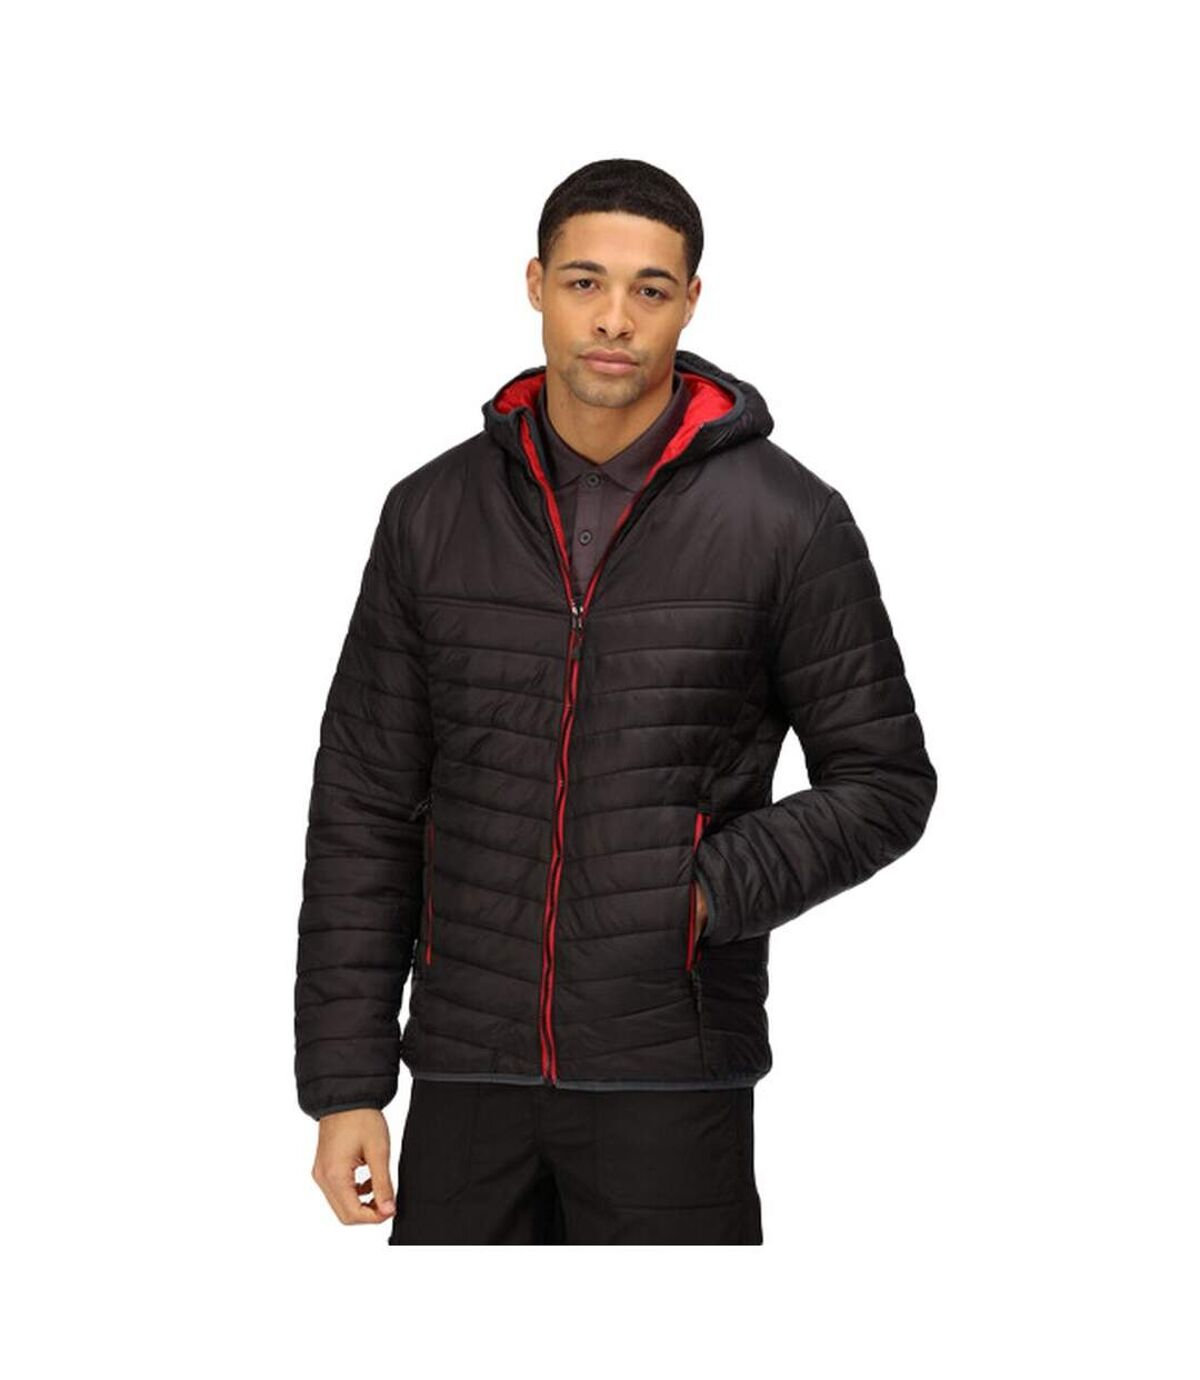 Regatta Mens Acadia II Hooded Jacket (Graphite Black/Orient Red) - UTRG3745